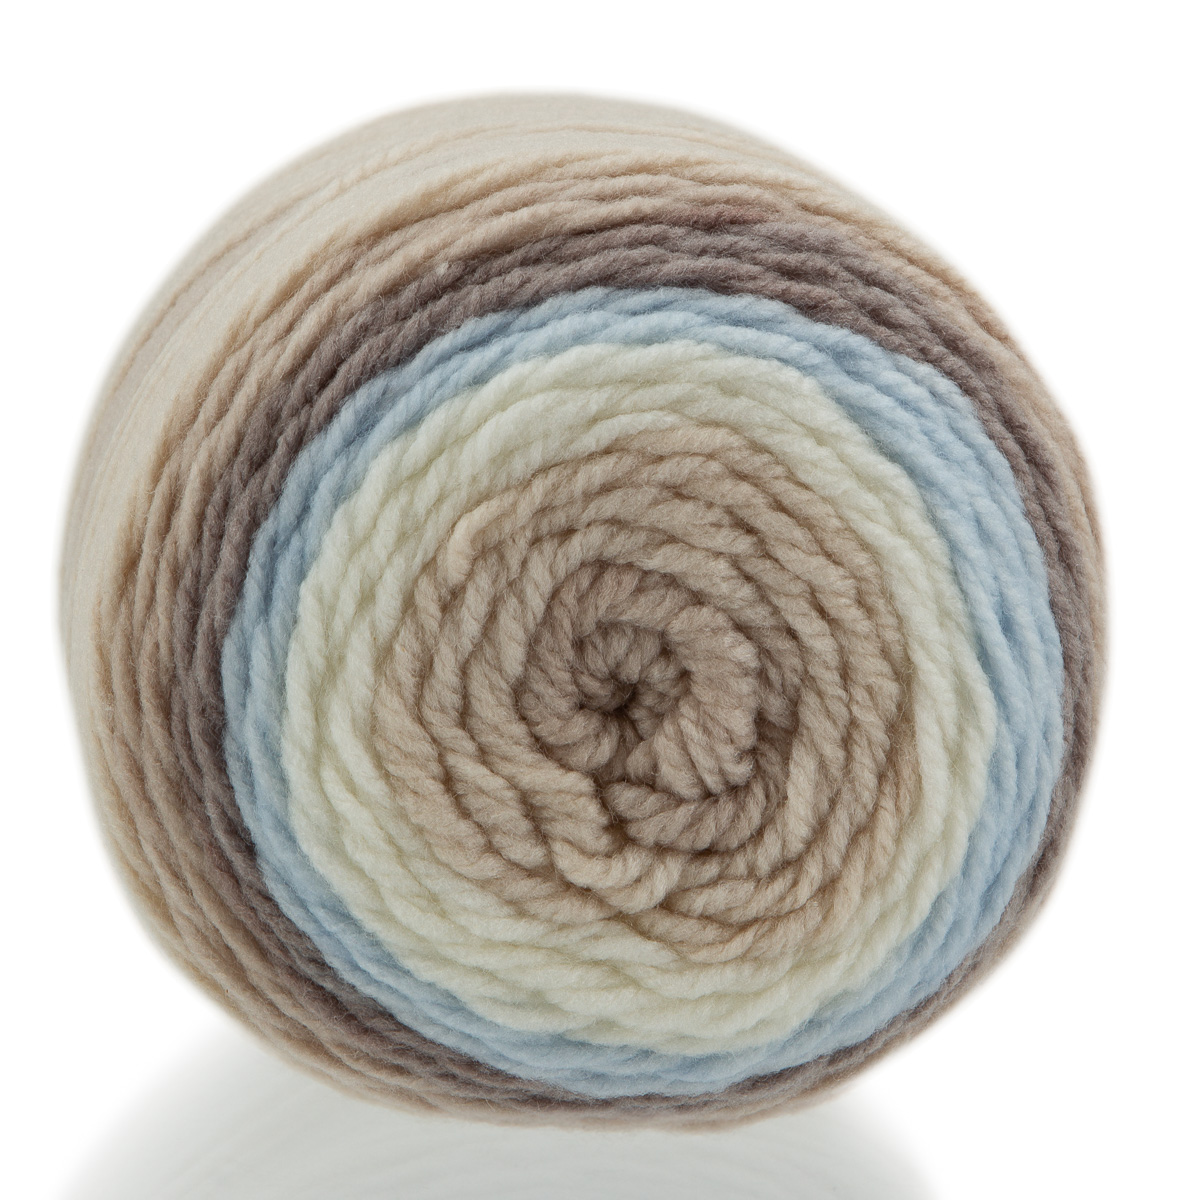 Caron-Baby-Cakes-Yarnspirations-Soft-Acrylic-Blend-Medium-4-Yarn-Cake-Knitting thumbnail 8